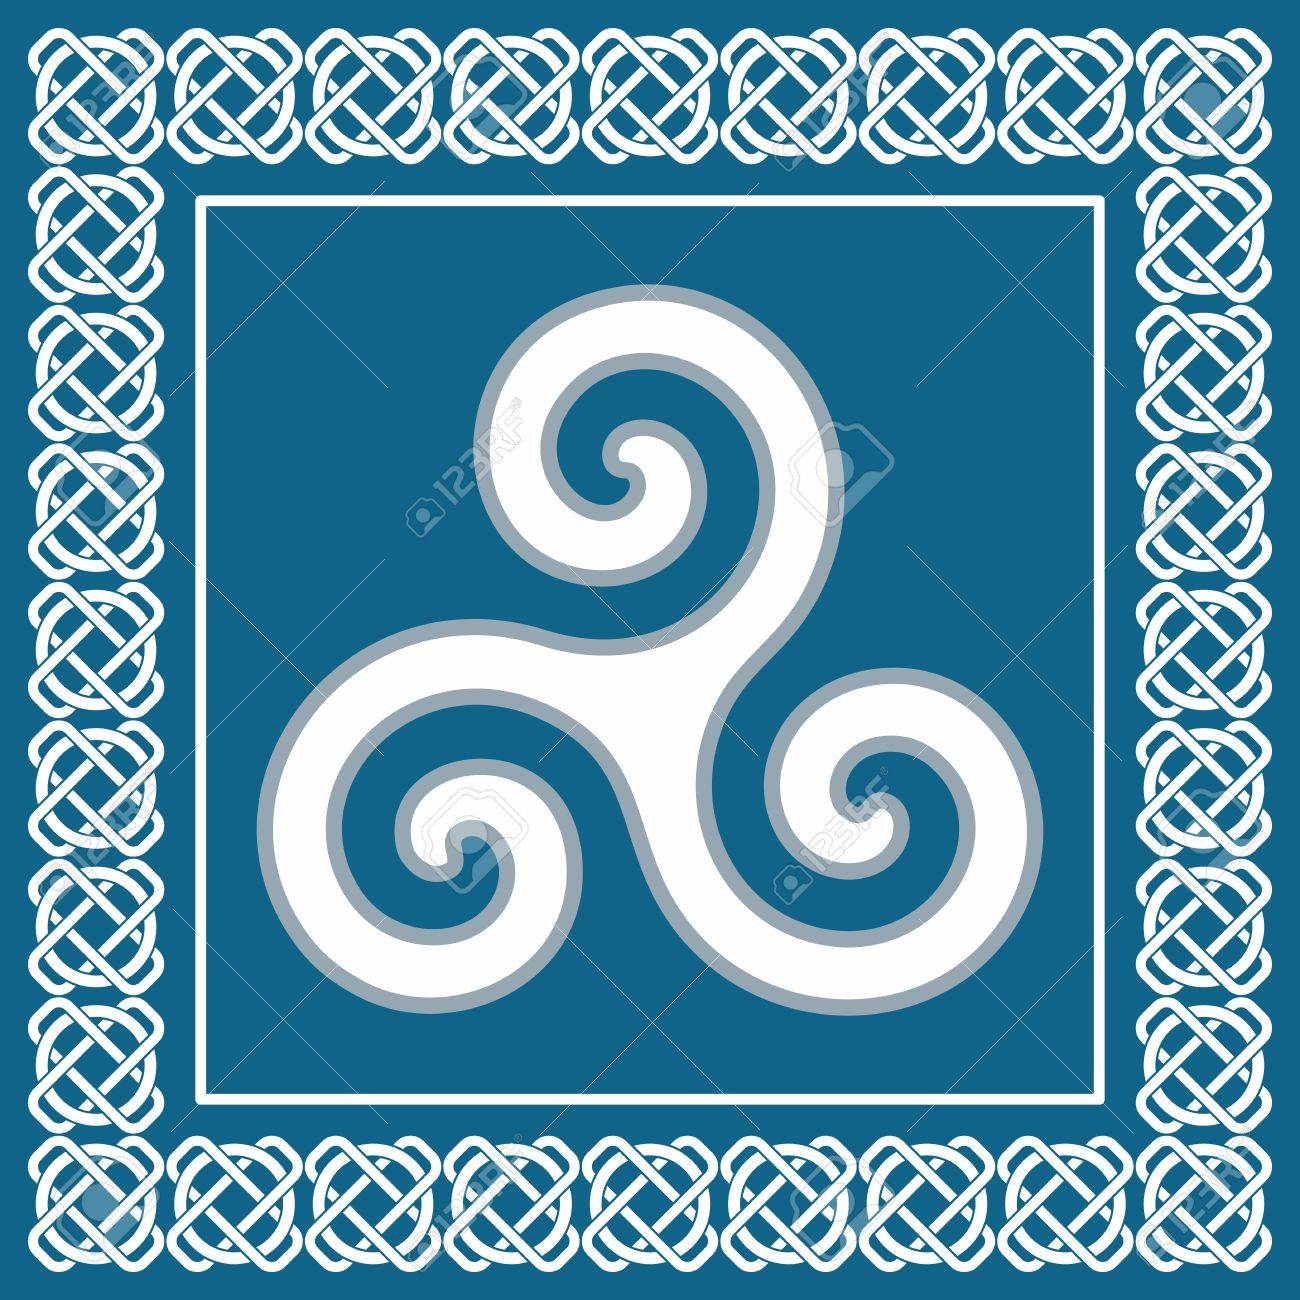 Ancient symbol triskelion or triskele traditional element typical ancient symbol triskelion or triskele traditional element typical for celtic scandinavian ethnic design vector buycottarizona Images